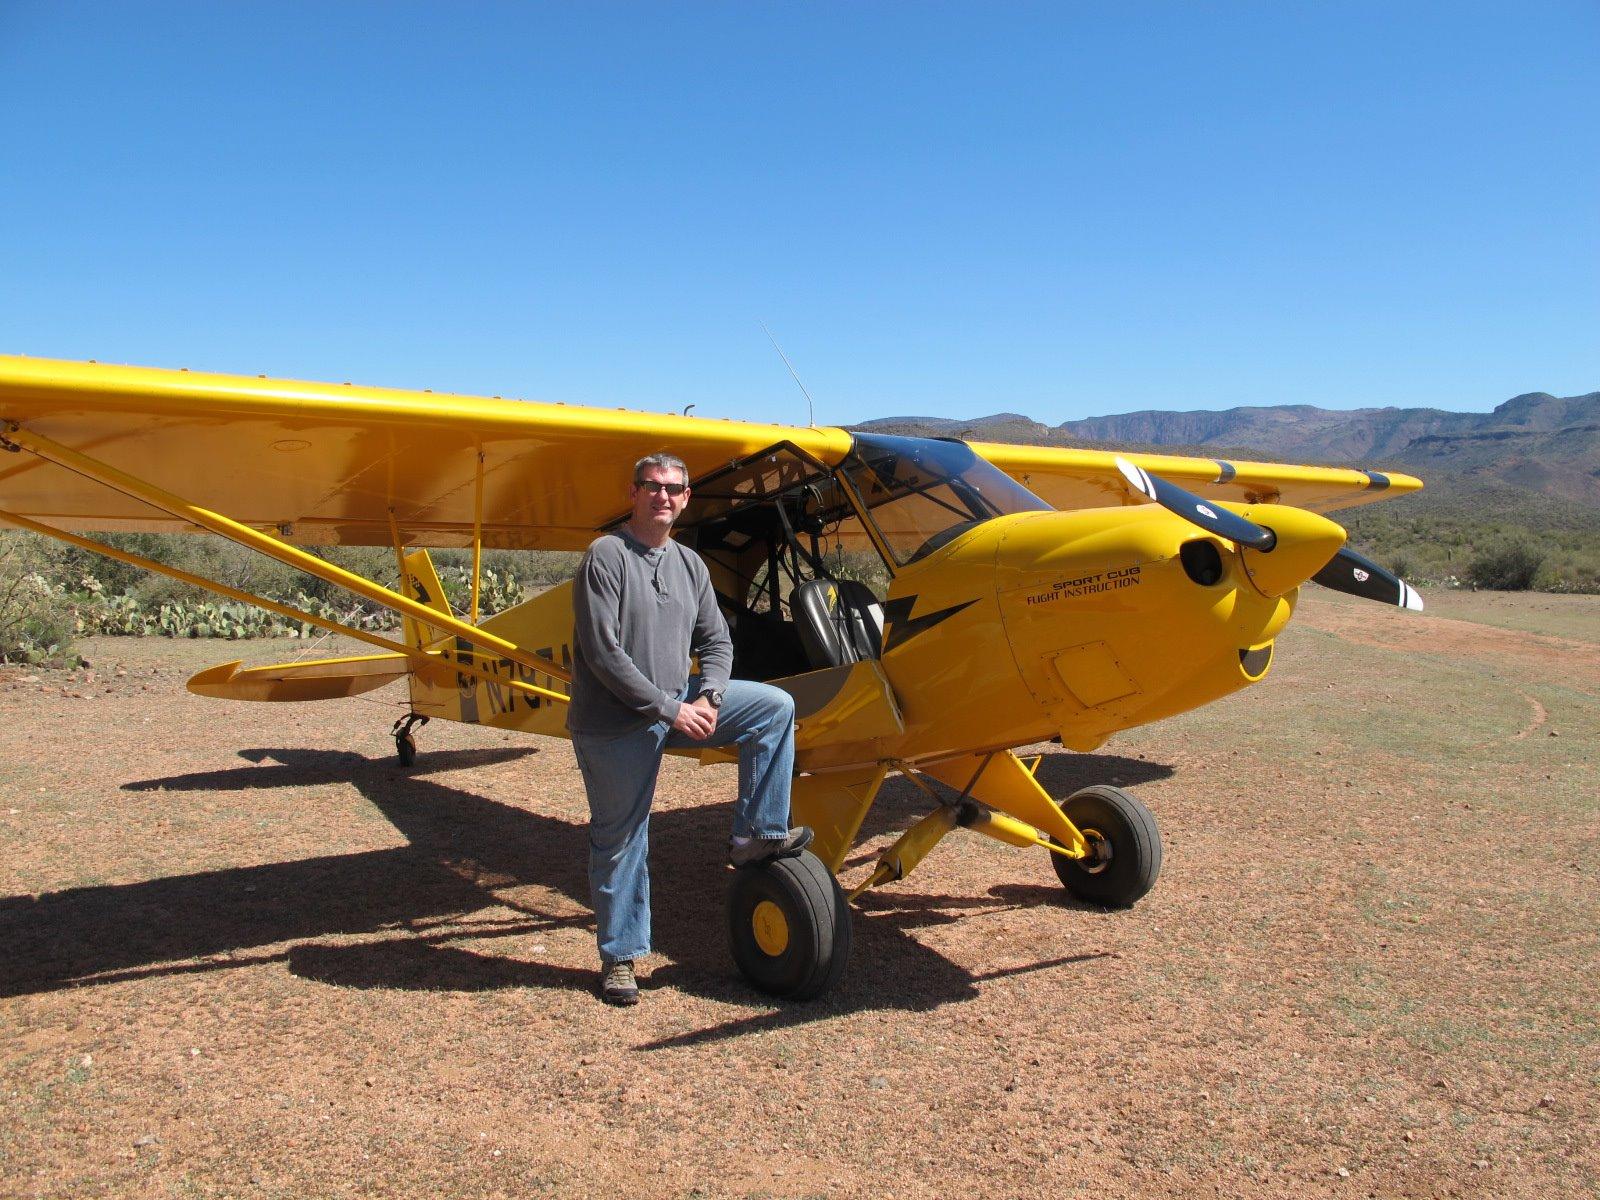 Backcountry Flying in Arizona